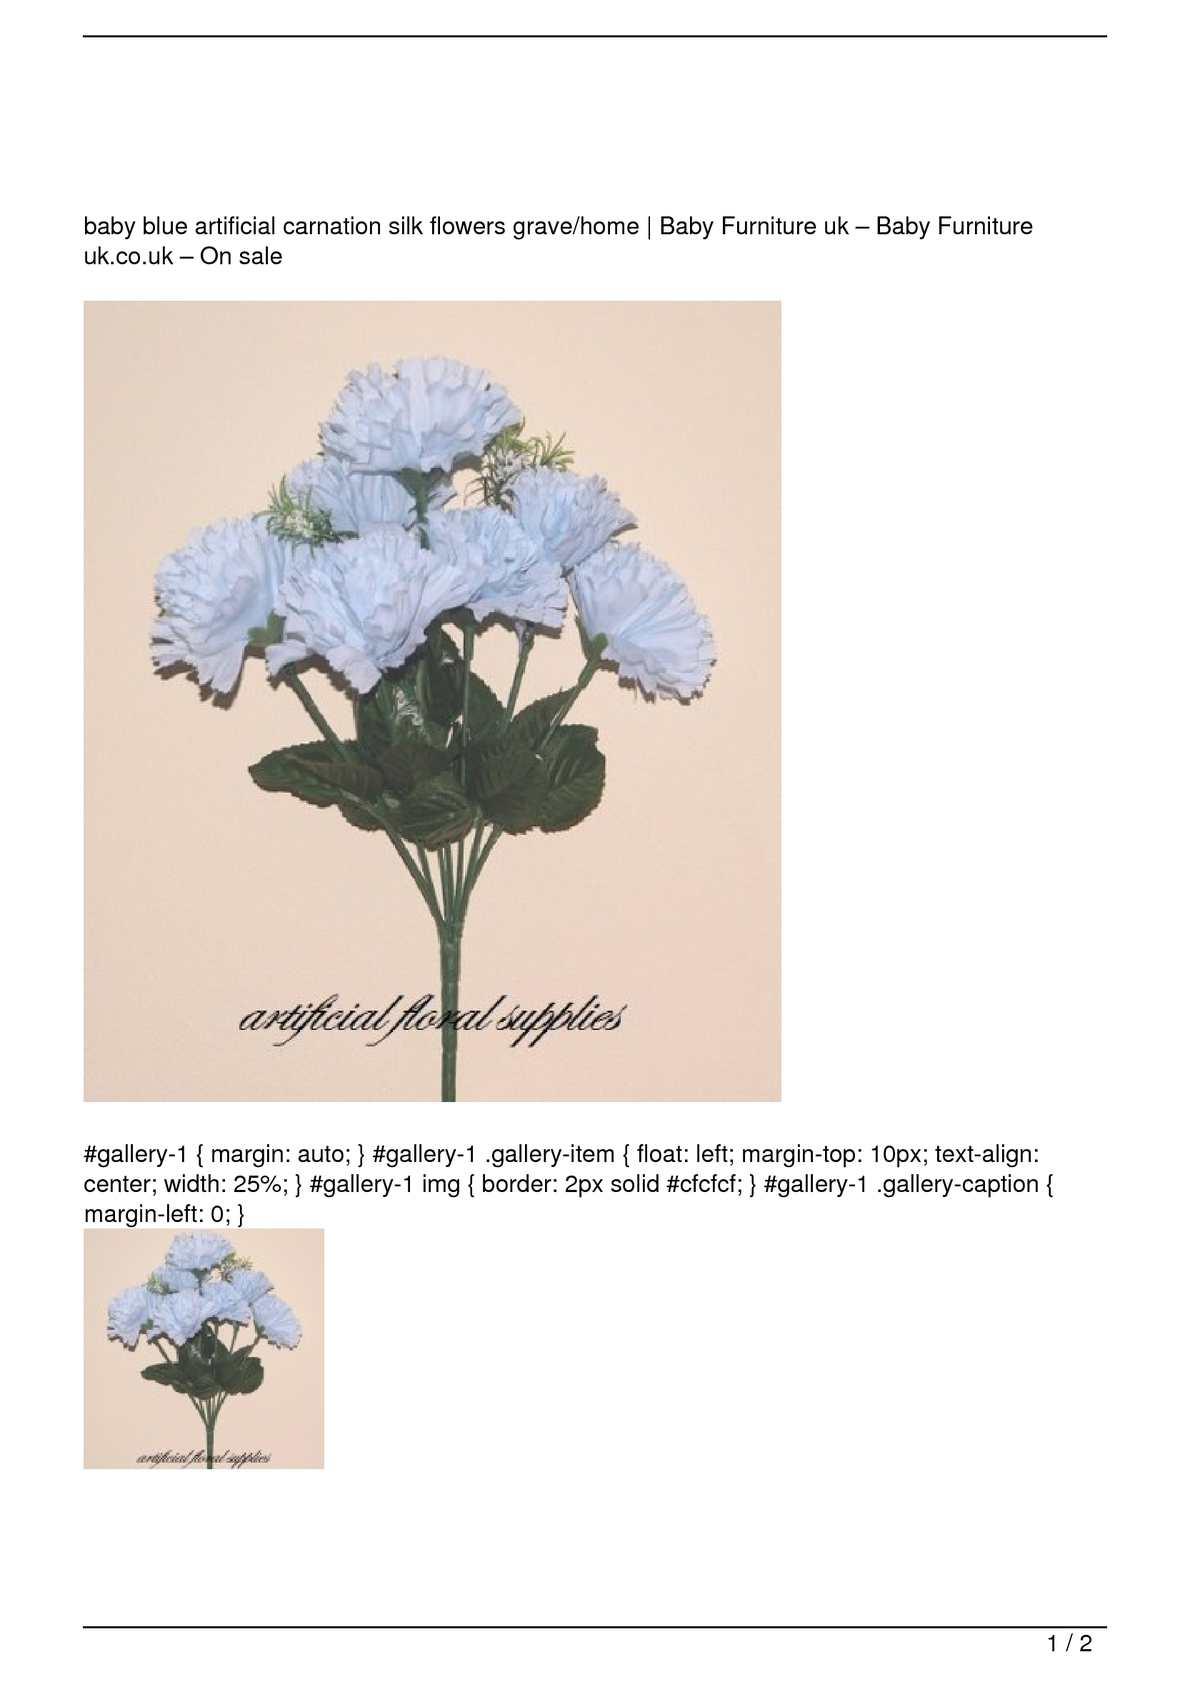 Calamo Baby Blue Artificial Carnation Silk Flowers Gravehome